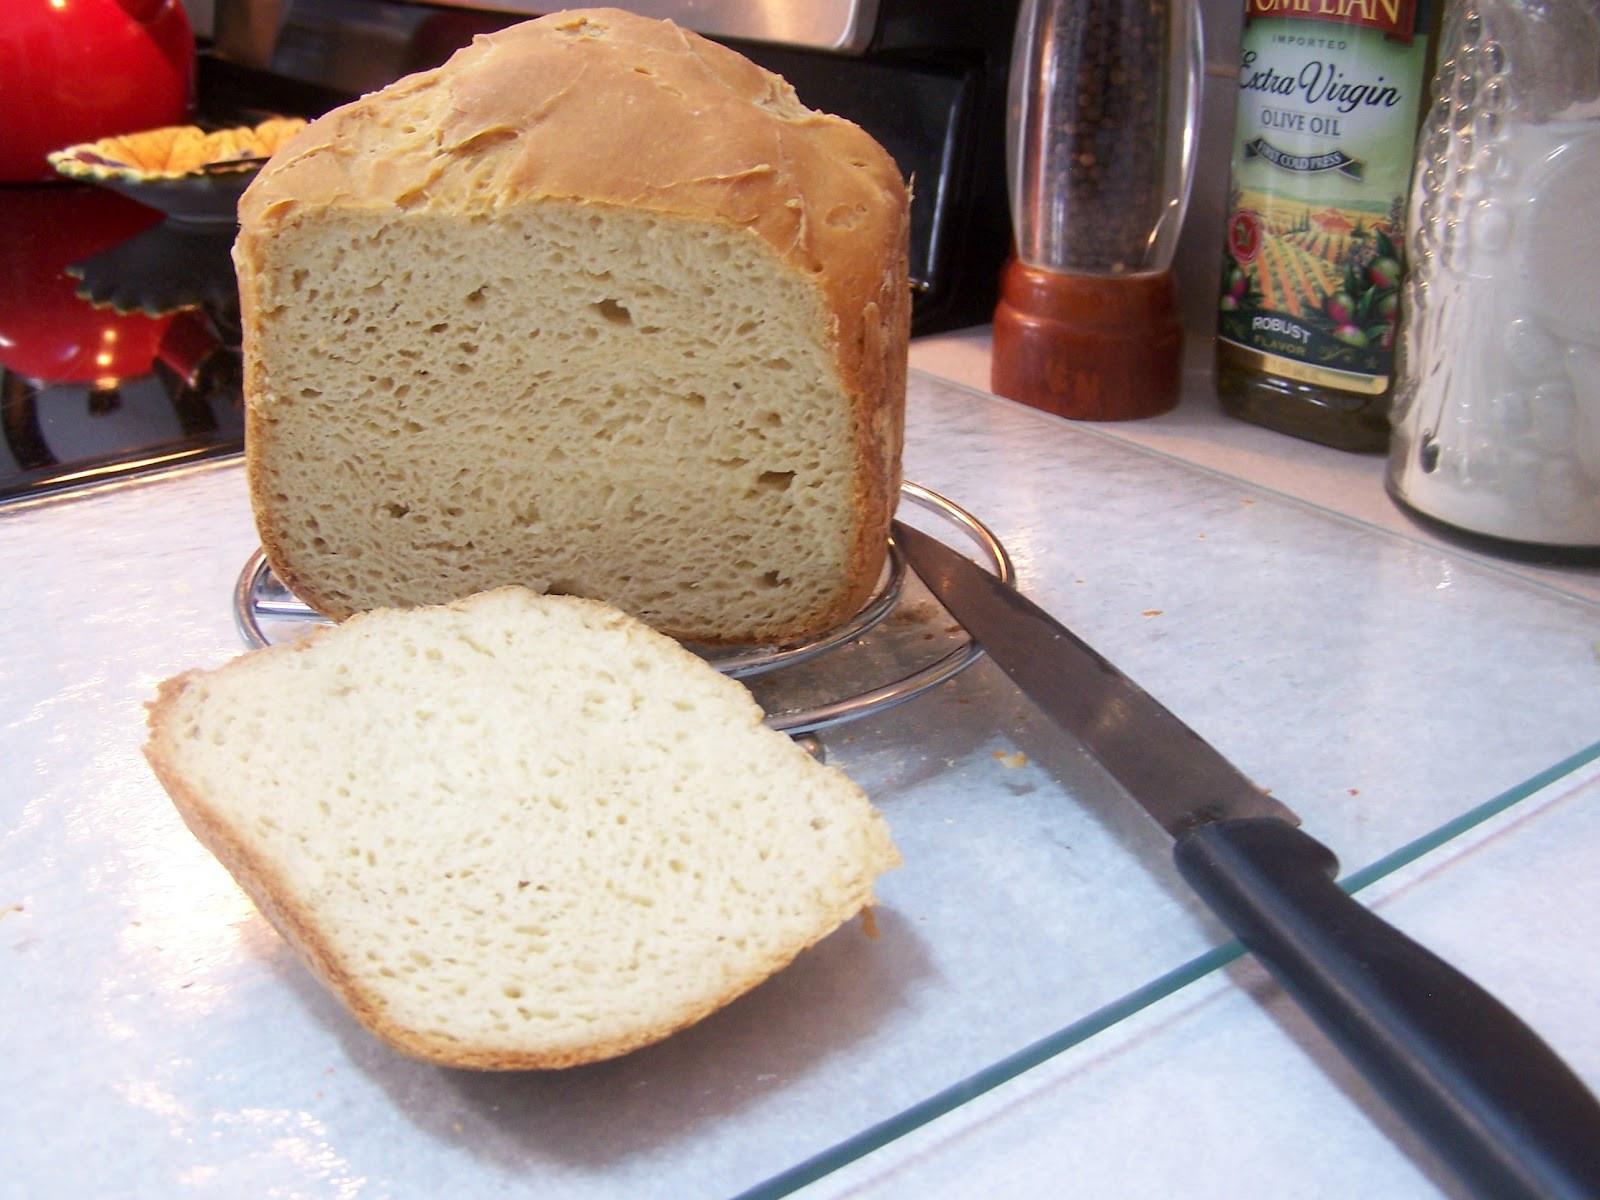 Healthy Bread Recipes For Bread Machines  Spectacular Gluten Free Bread in the Bread Machine